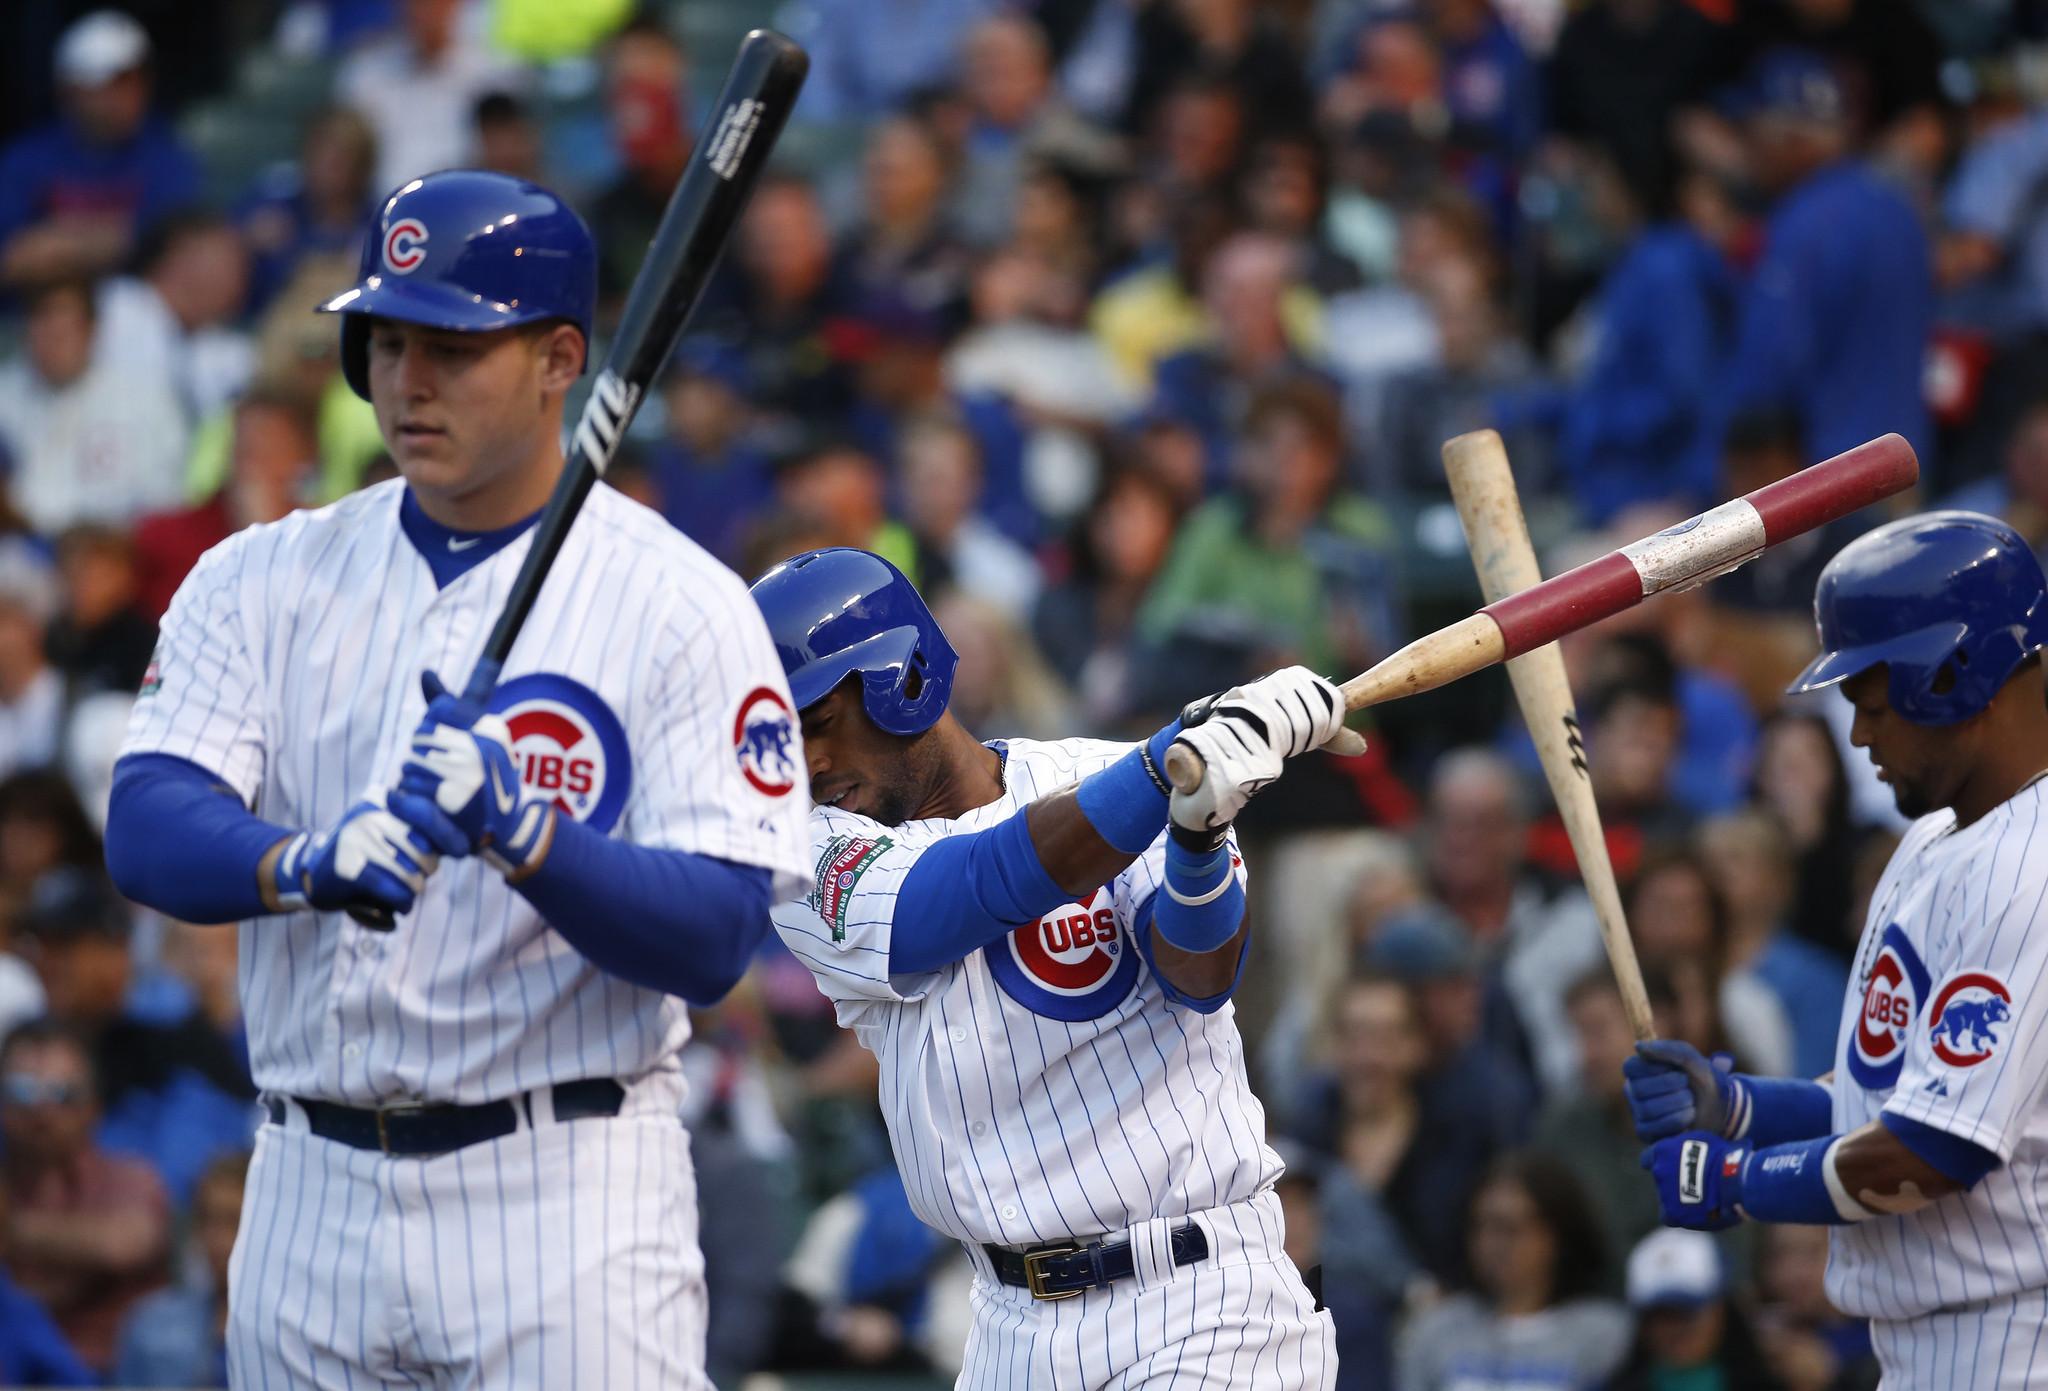 Cubs sending Barney to Dodgers